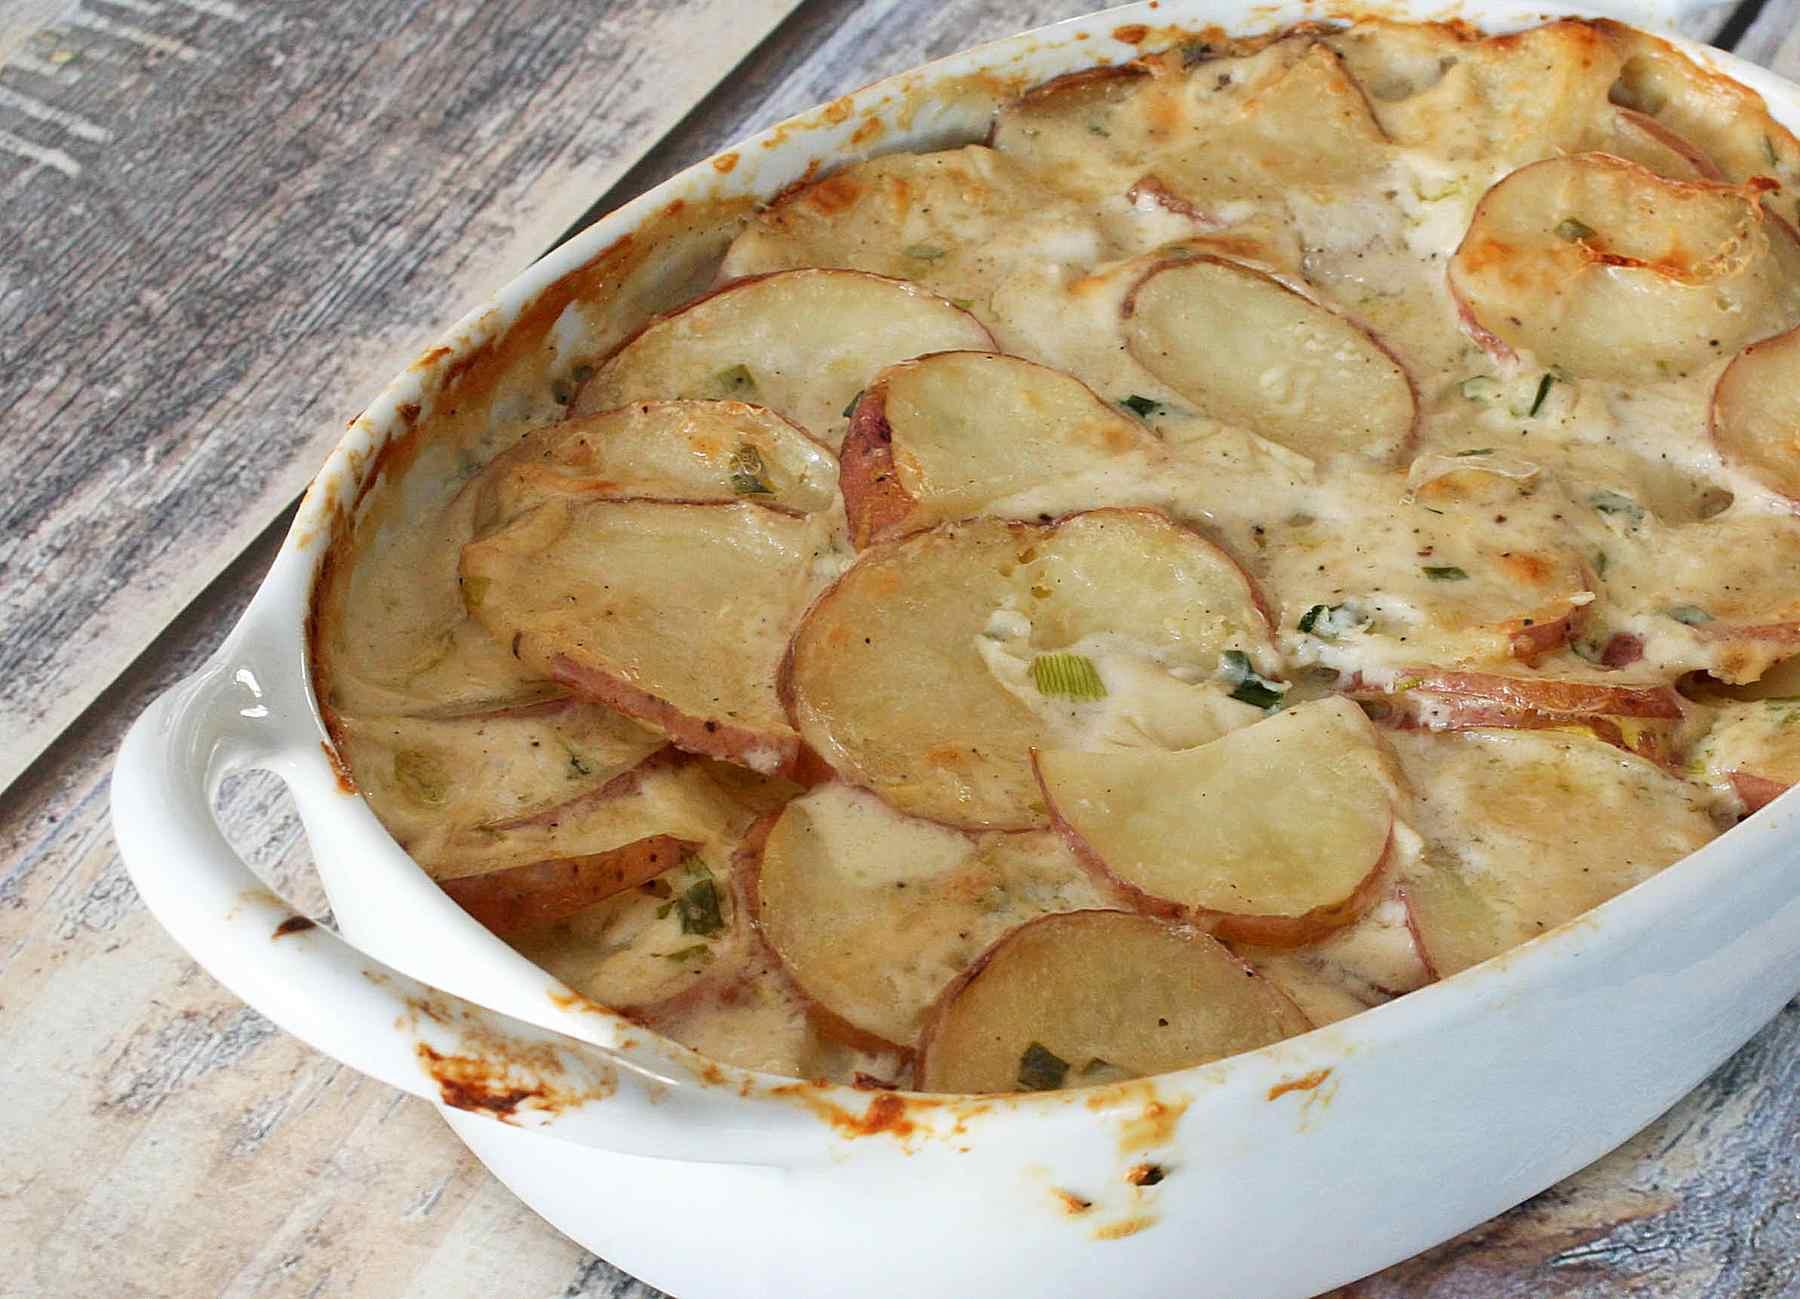 Savory Scalloped Potatoes With Green Onion